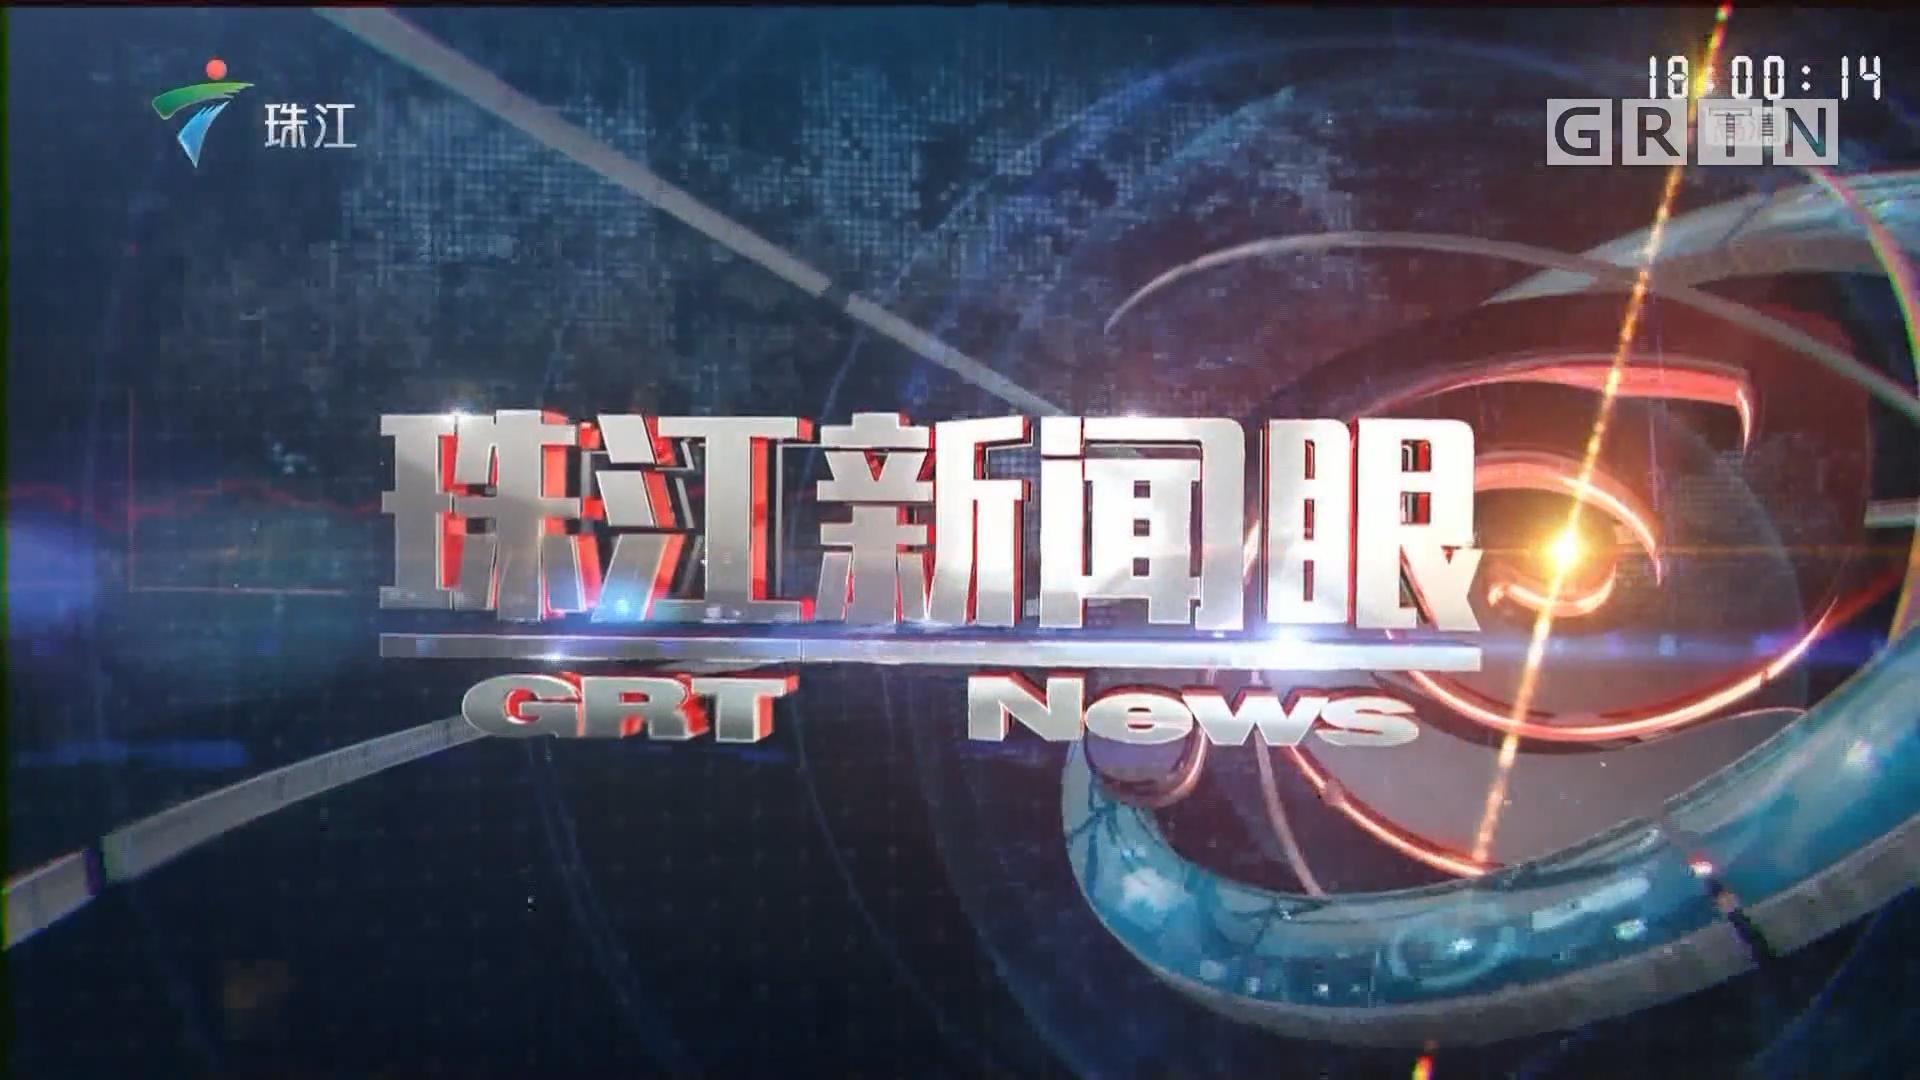 [HD][2019-04-14]珠江新闻眼:广东各地妇女载歌载舞礼赞新中国成立70周年